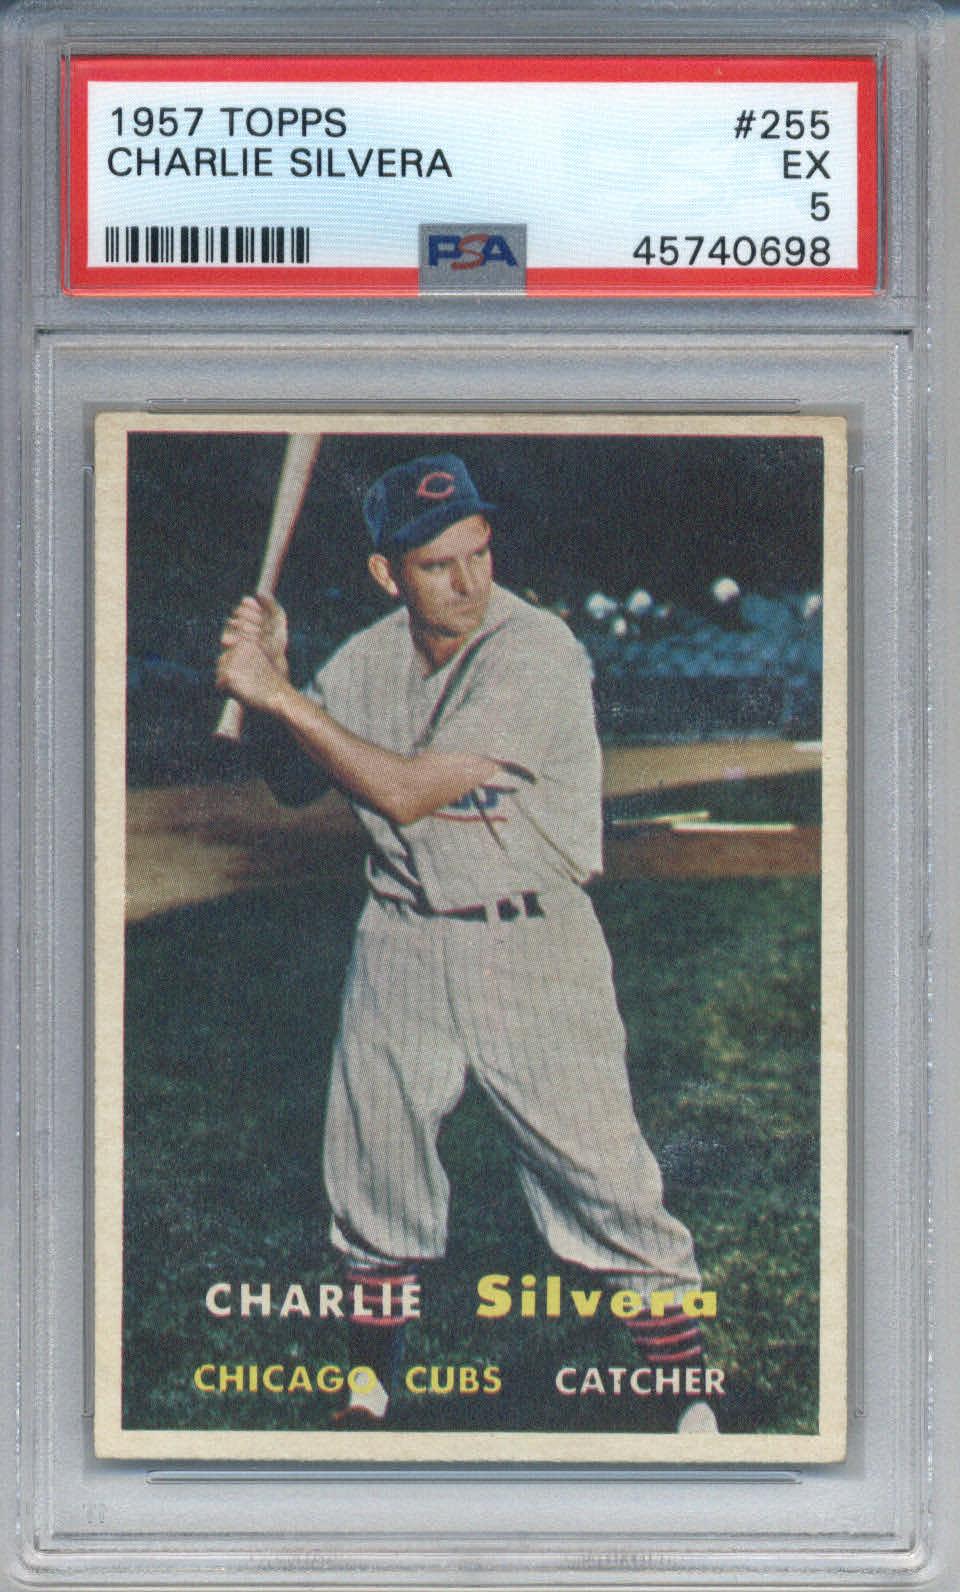 1957 Topps #255 Charlie Silvera PSA 5